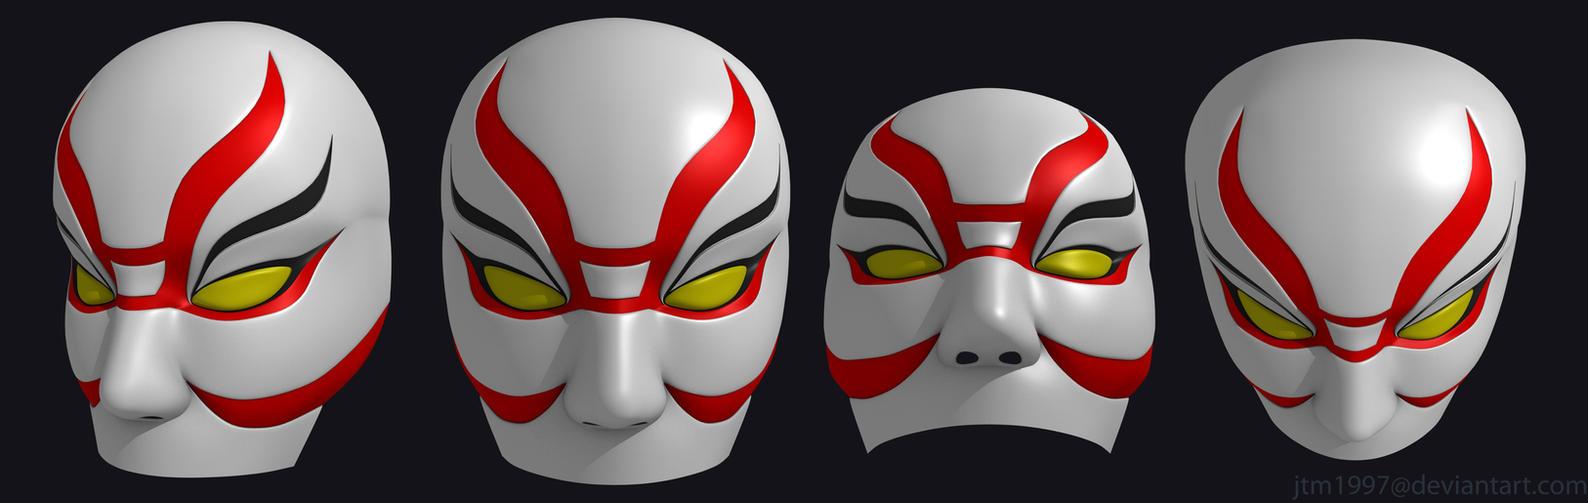 kabuki mask template - big hero 6 villain mask by jtm1997 on deviantart